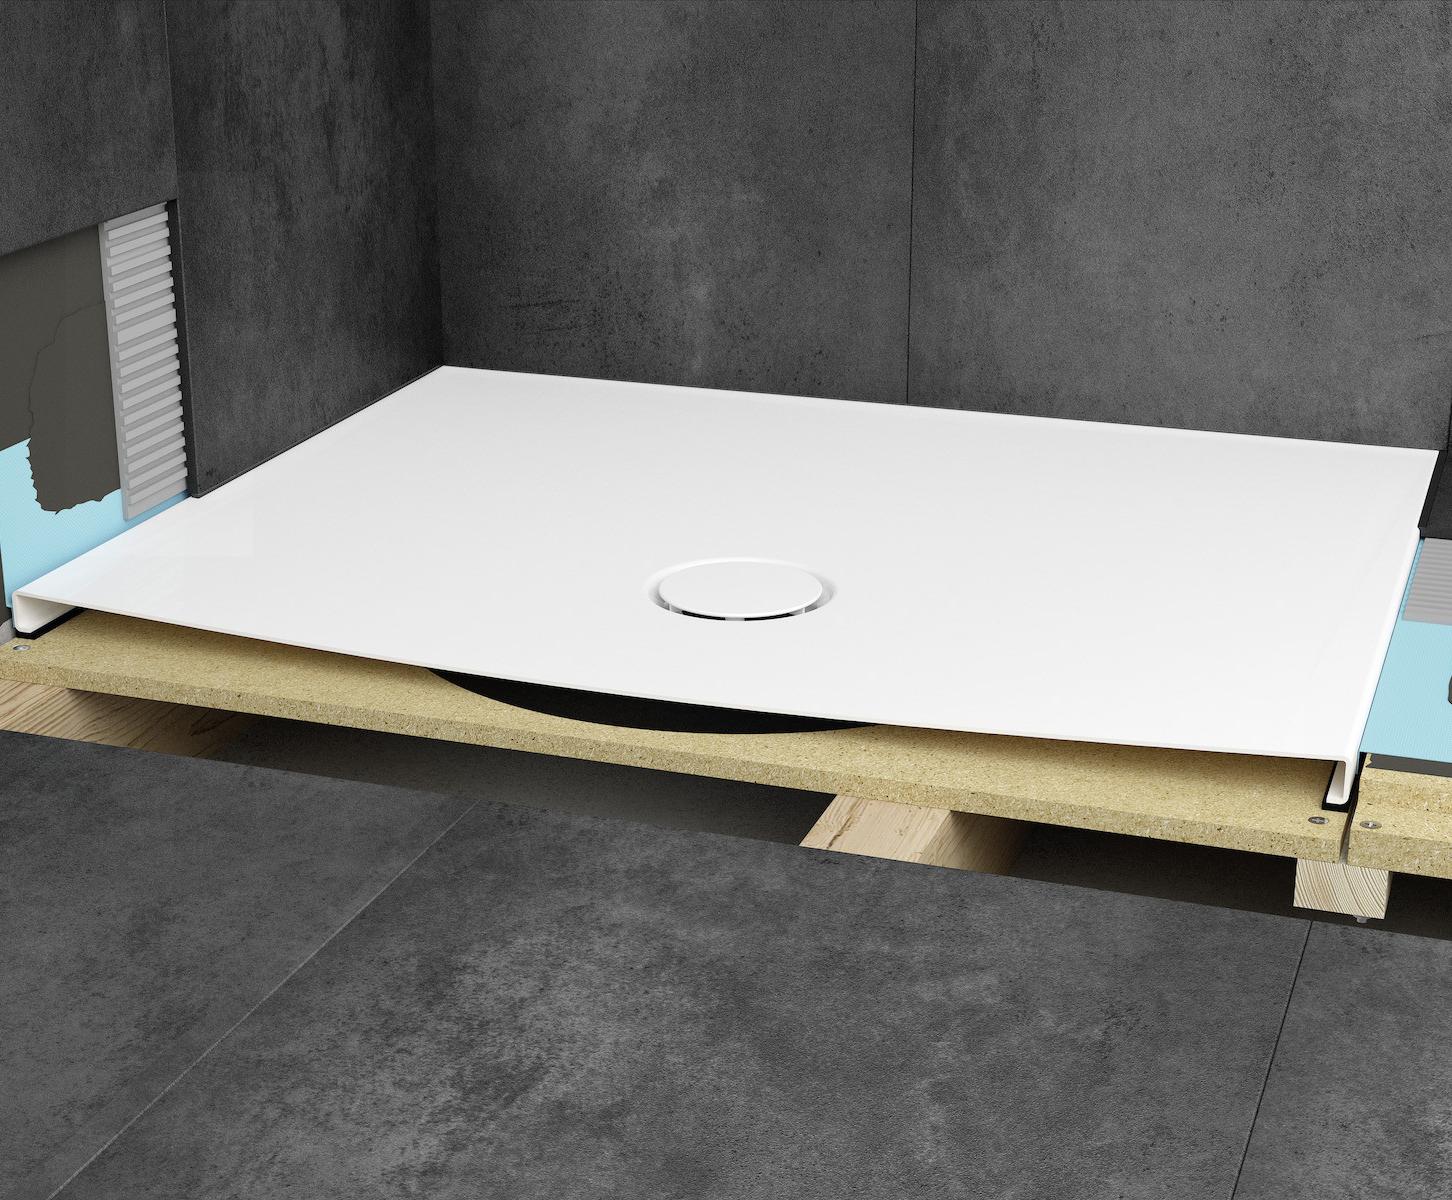 Full Size of Bette Floor Shower Tray Colours Duschwanne Reinigung Douchebak Waste Side Abfluss Reinigen Bettefloor Brausetasse Ablauf Lamp Installation Sealing Set Soakology Bett Bette Floor